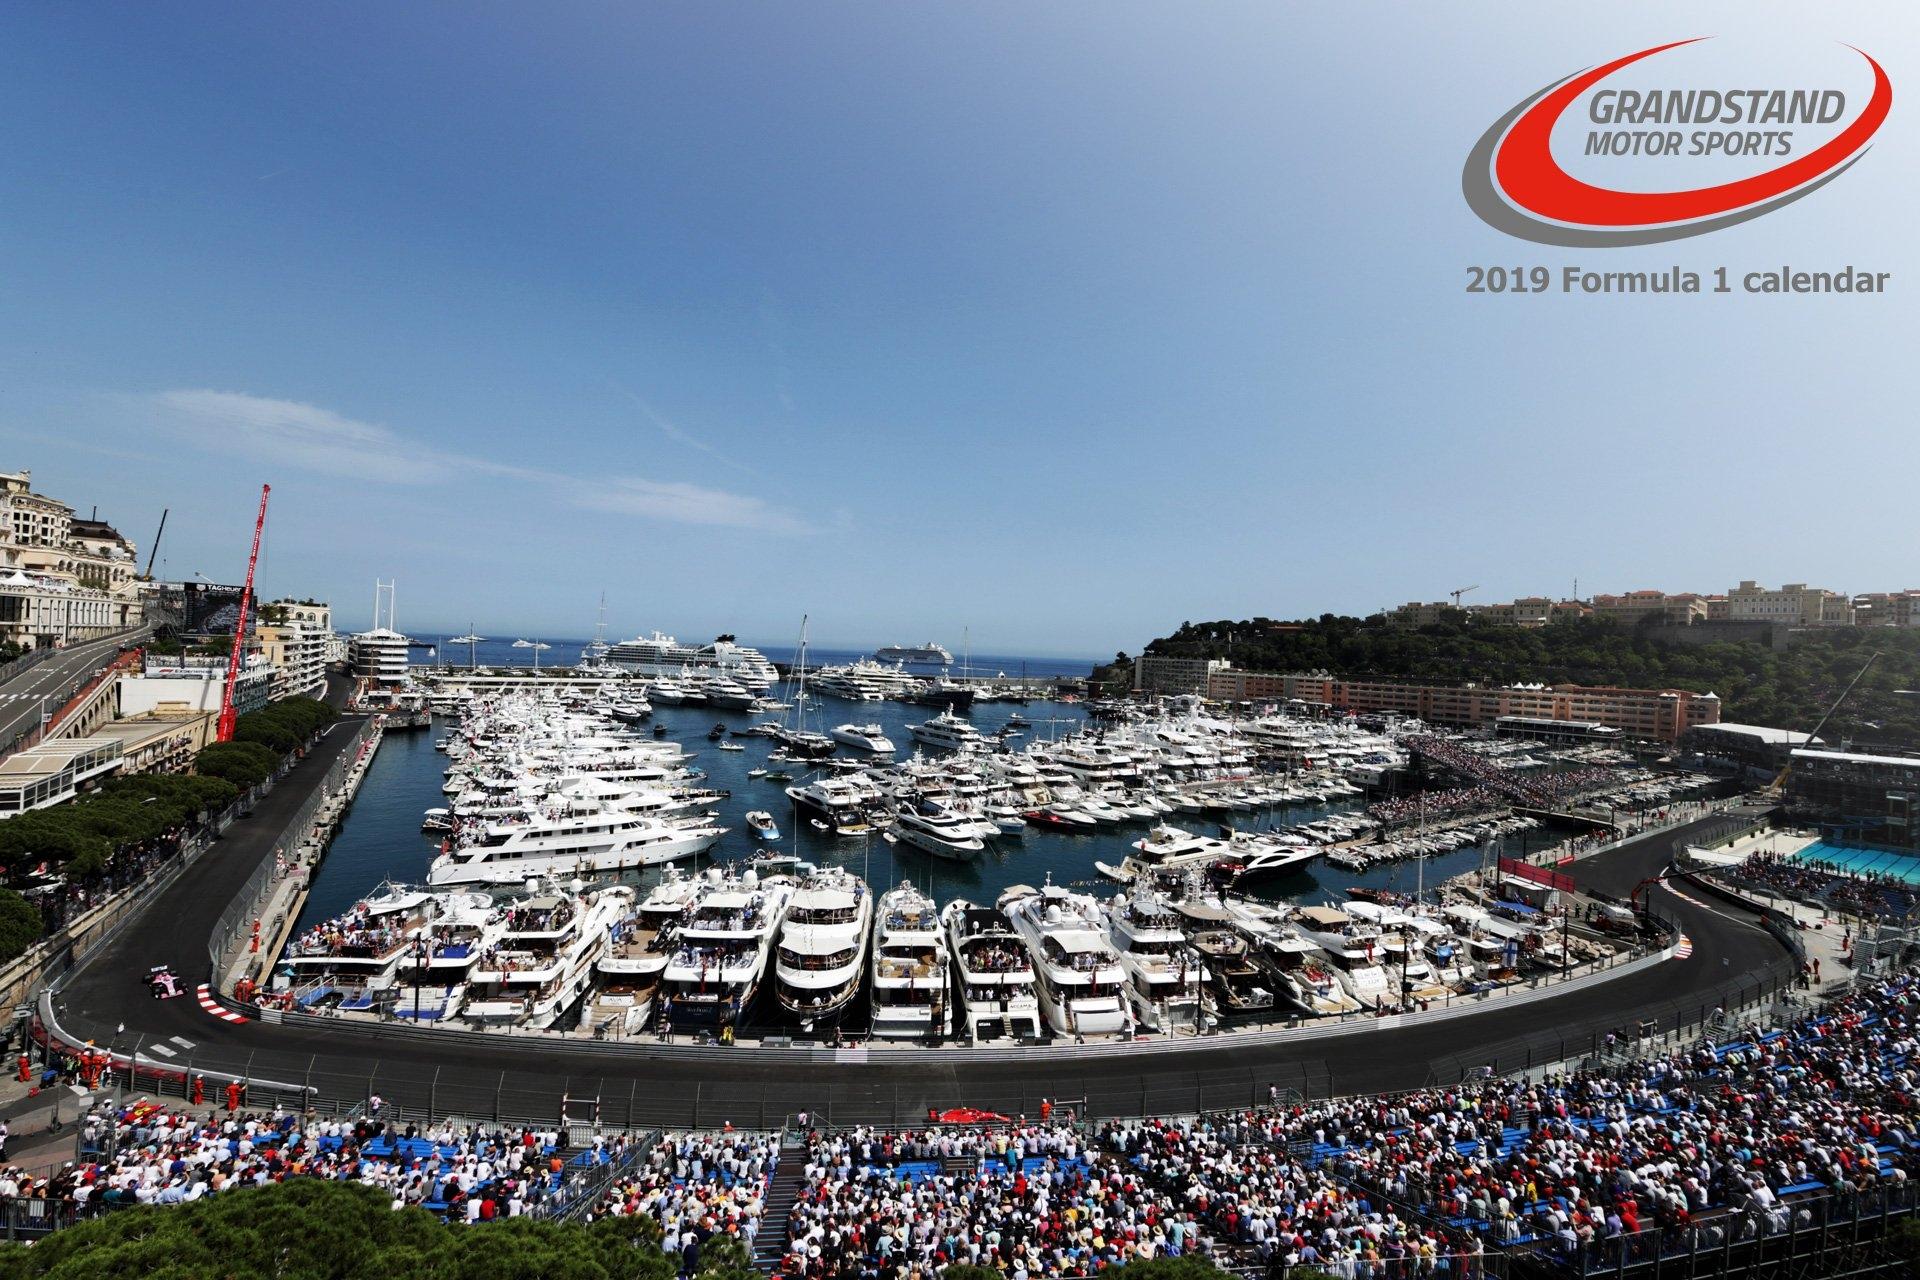 2019 F1 Calendar: Formula One Race Schedule - Racefans Formula E Calendar 2019 Ical